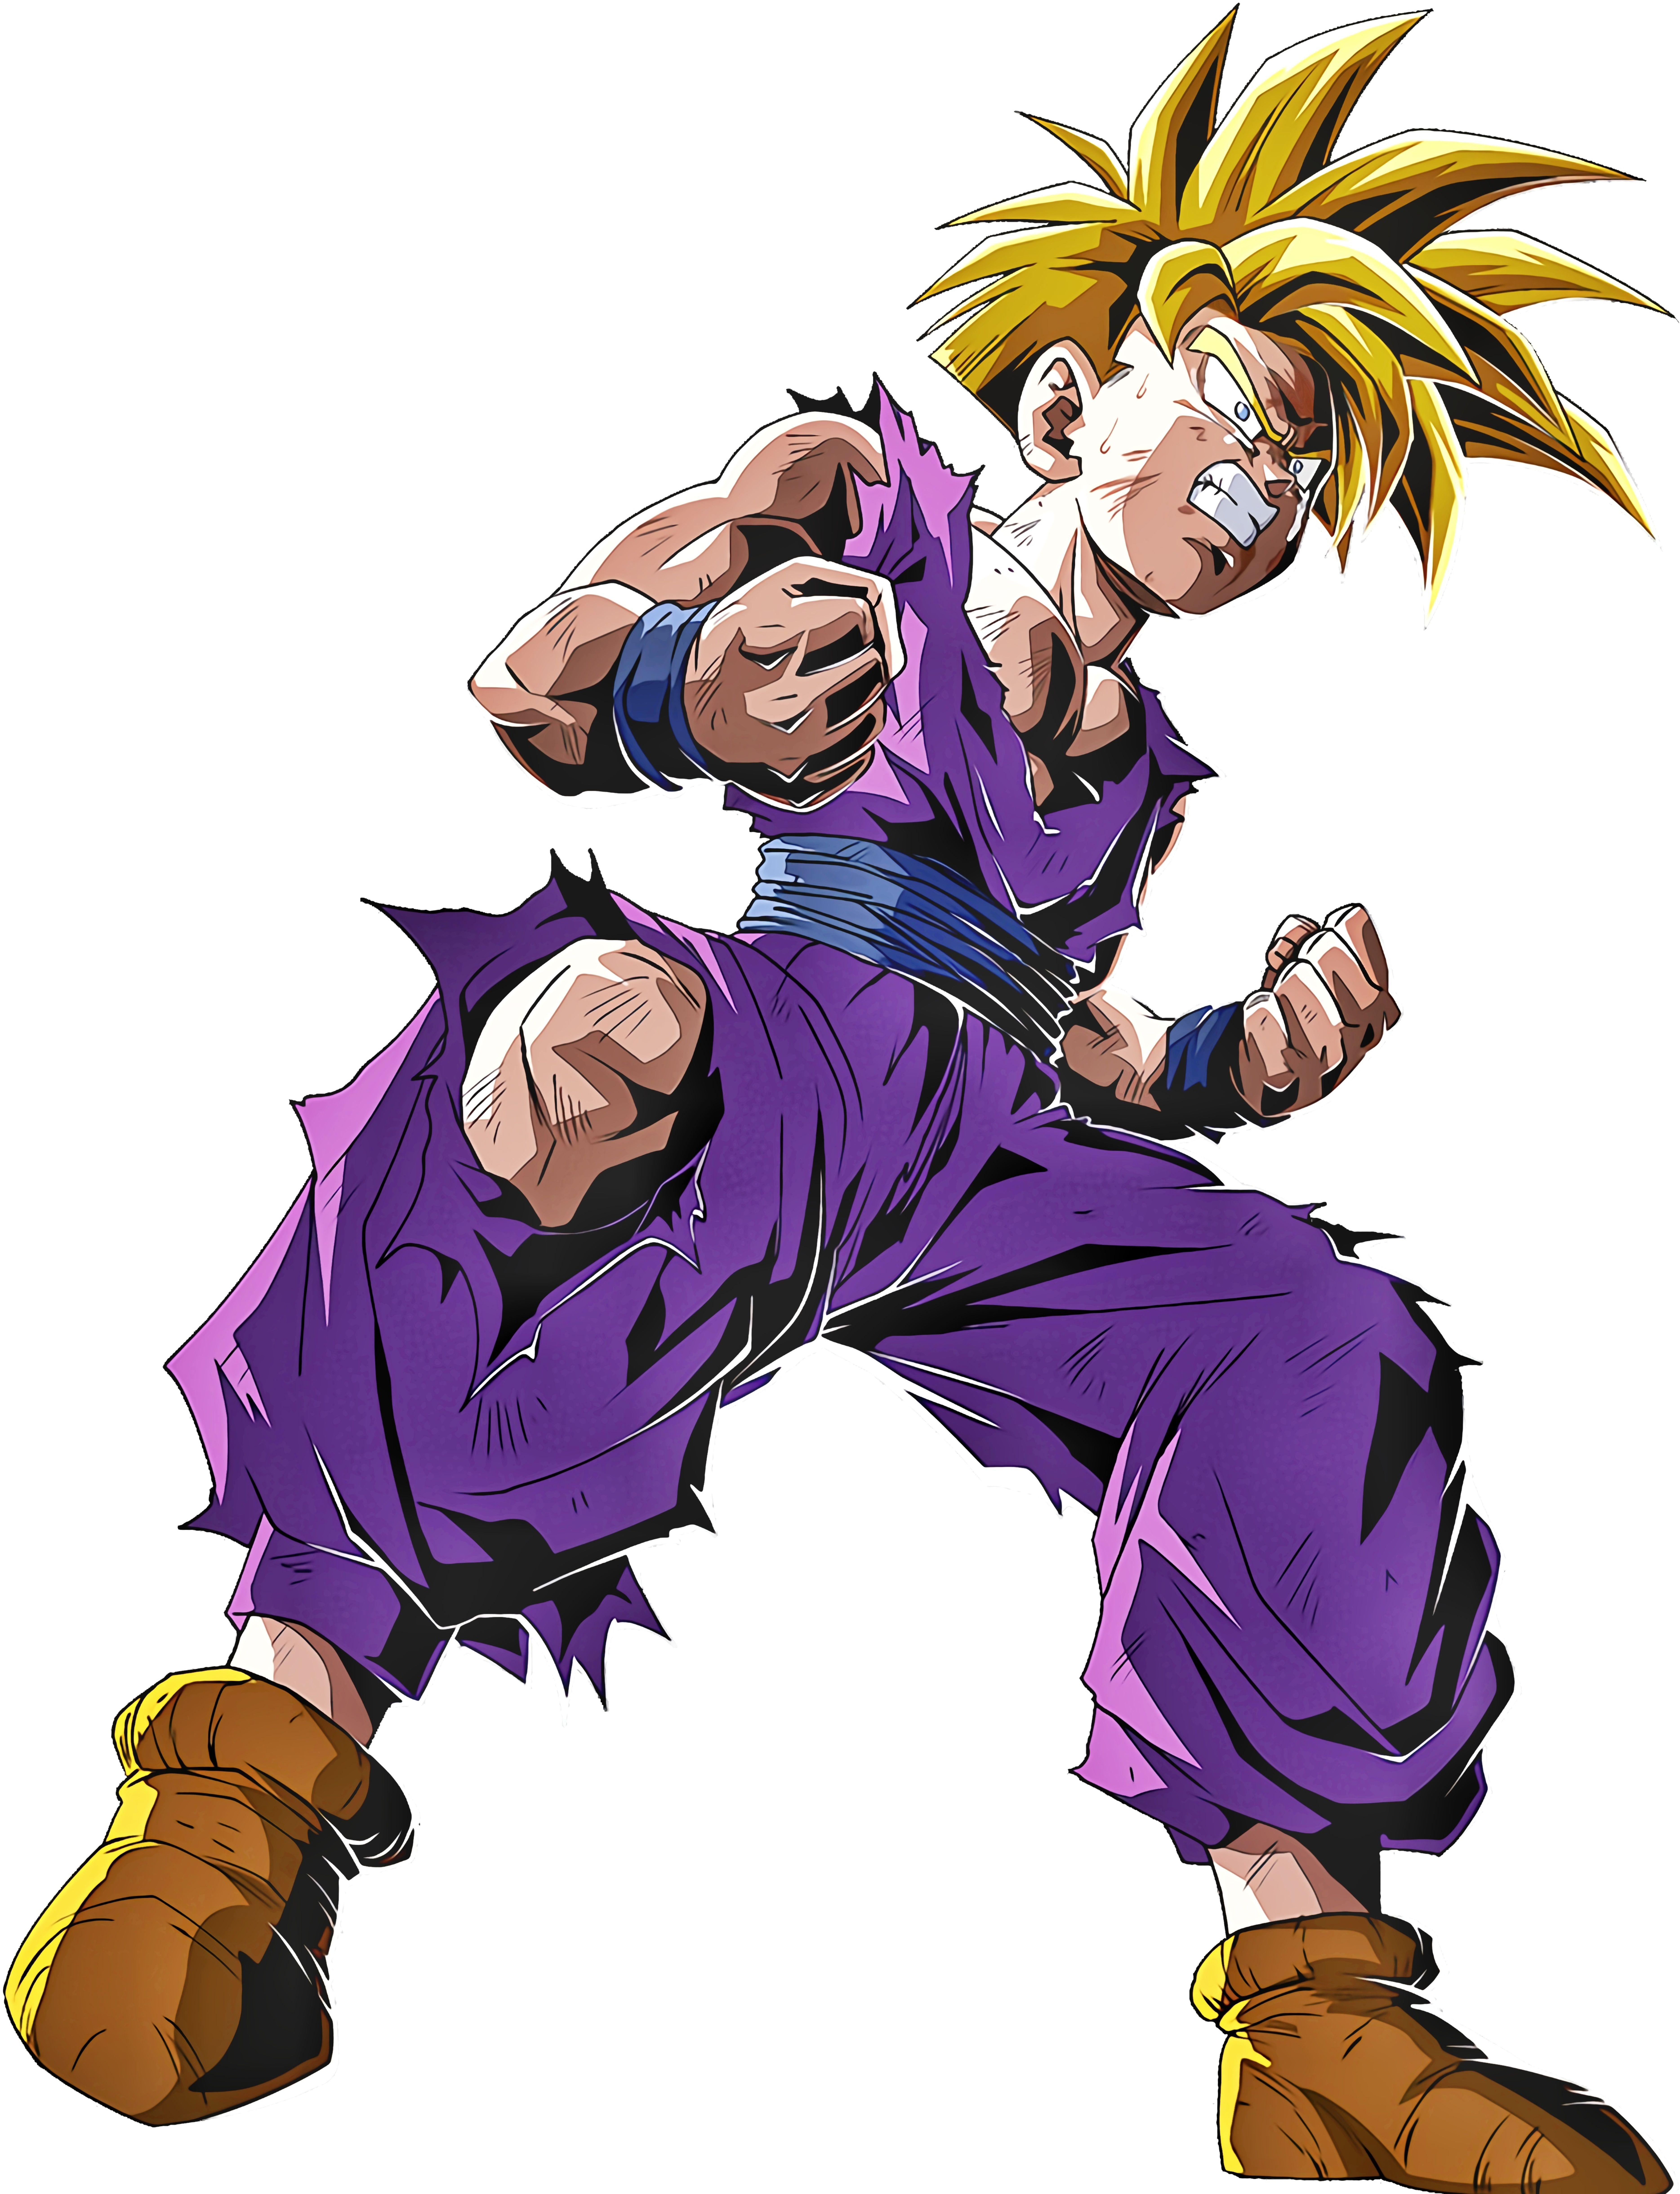 Gohan Ssj Personajes De Goku Personajes De Dragon Ball Dragones